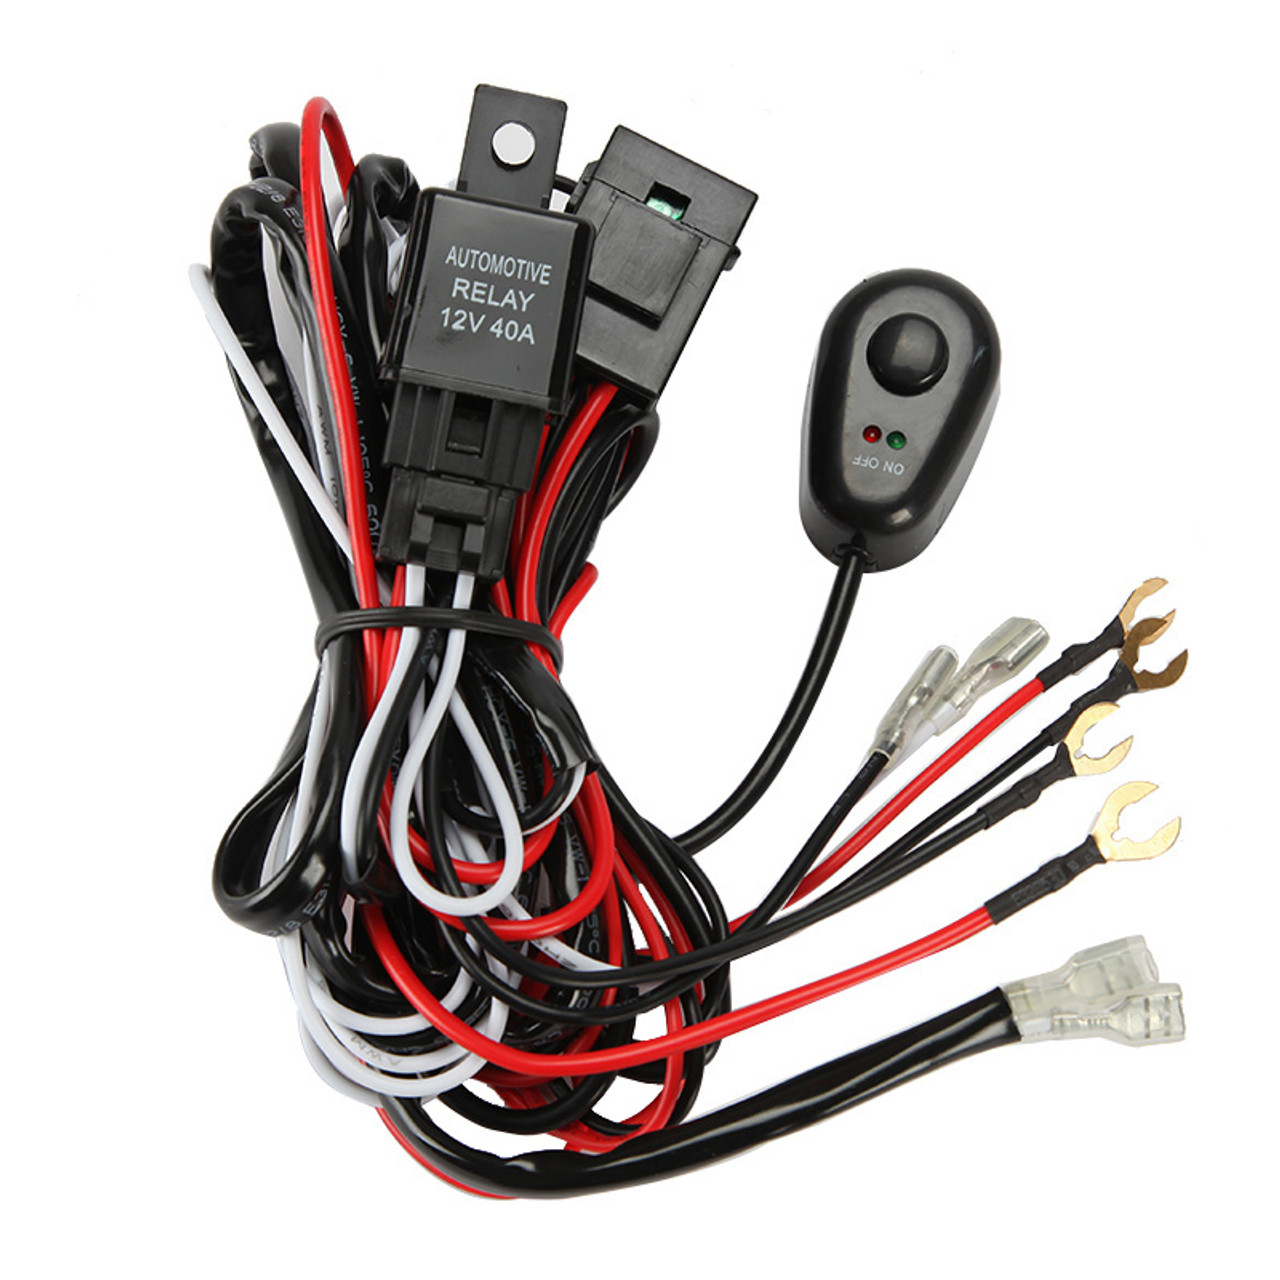 12v 40a led light bar wiring harness kit dual lights rh 4x4truckleds com ez wiring harness kits auto wiring harness kits